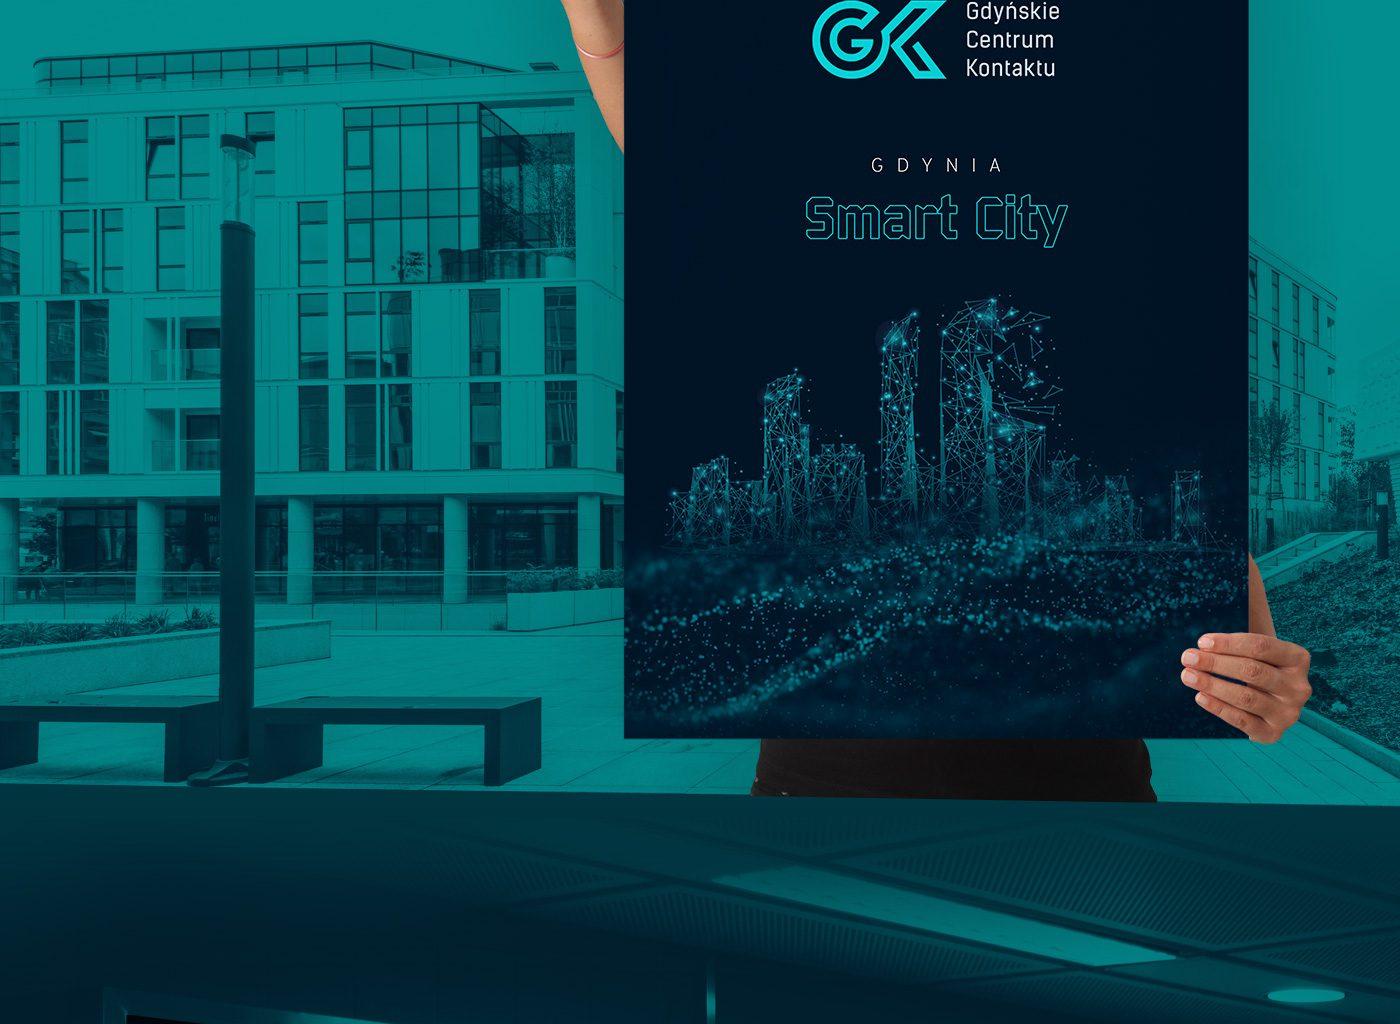 Gdyńskie Centrum Kontaktu 4